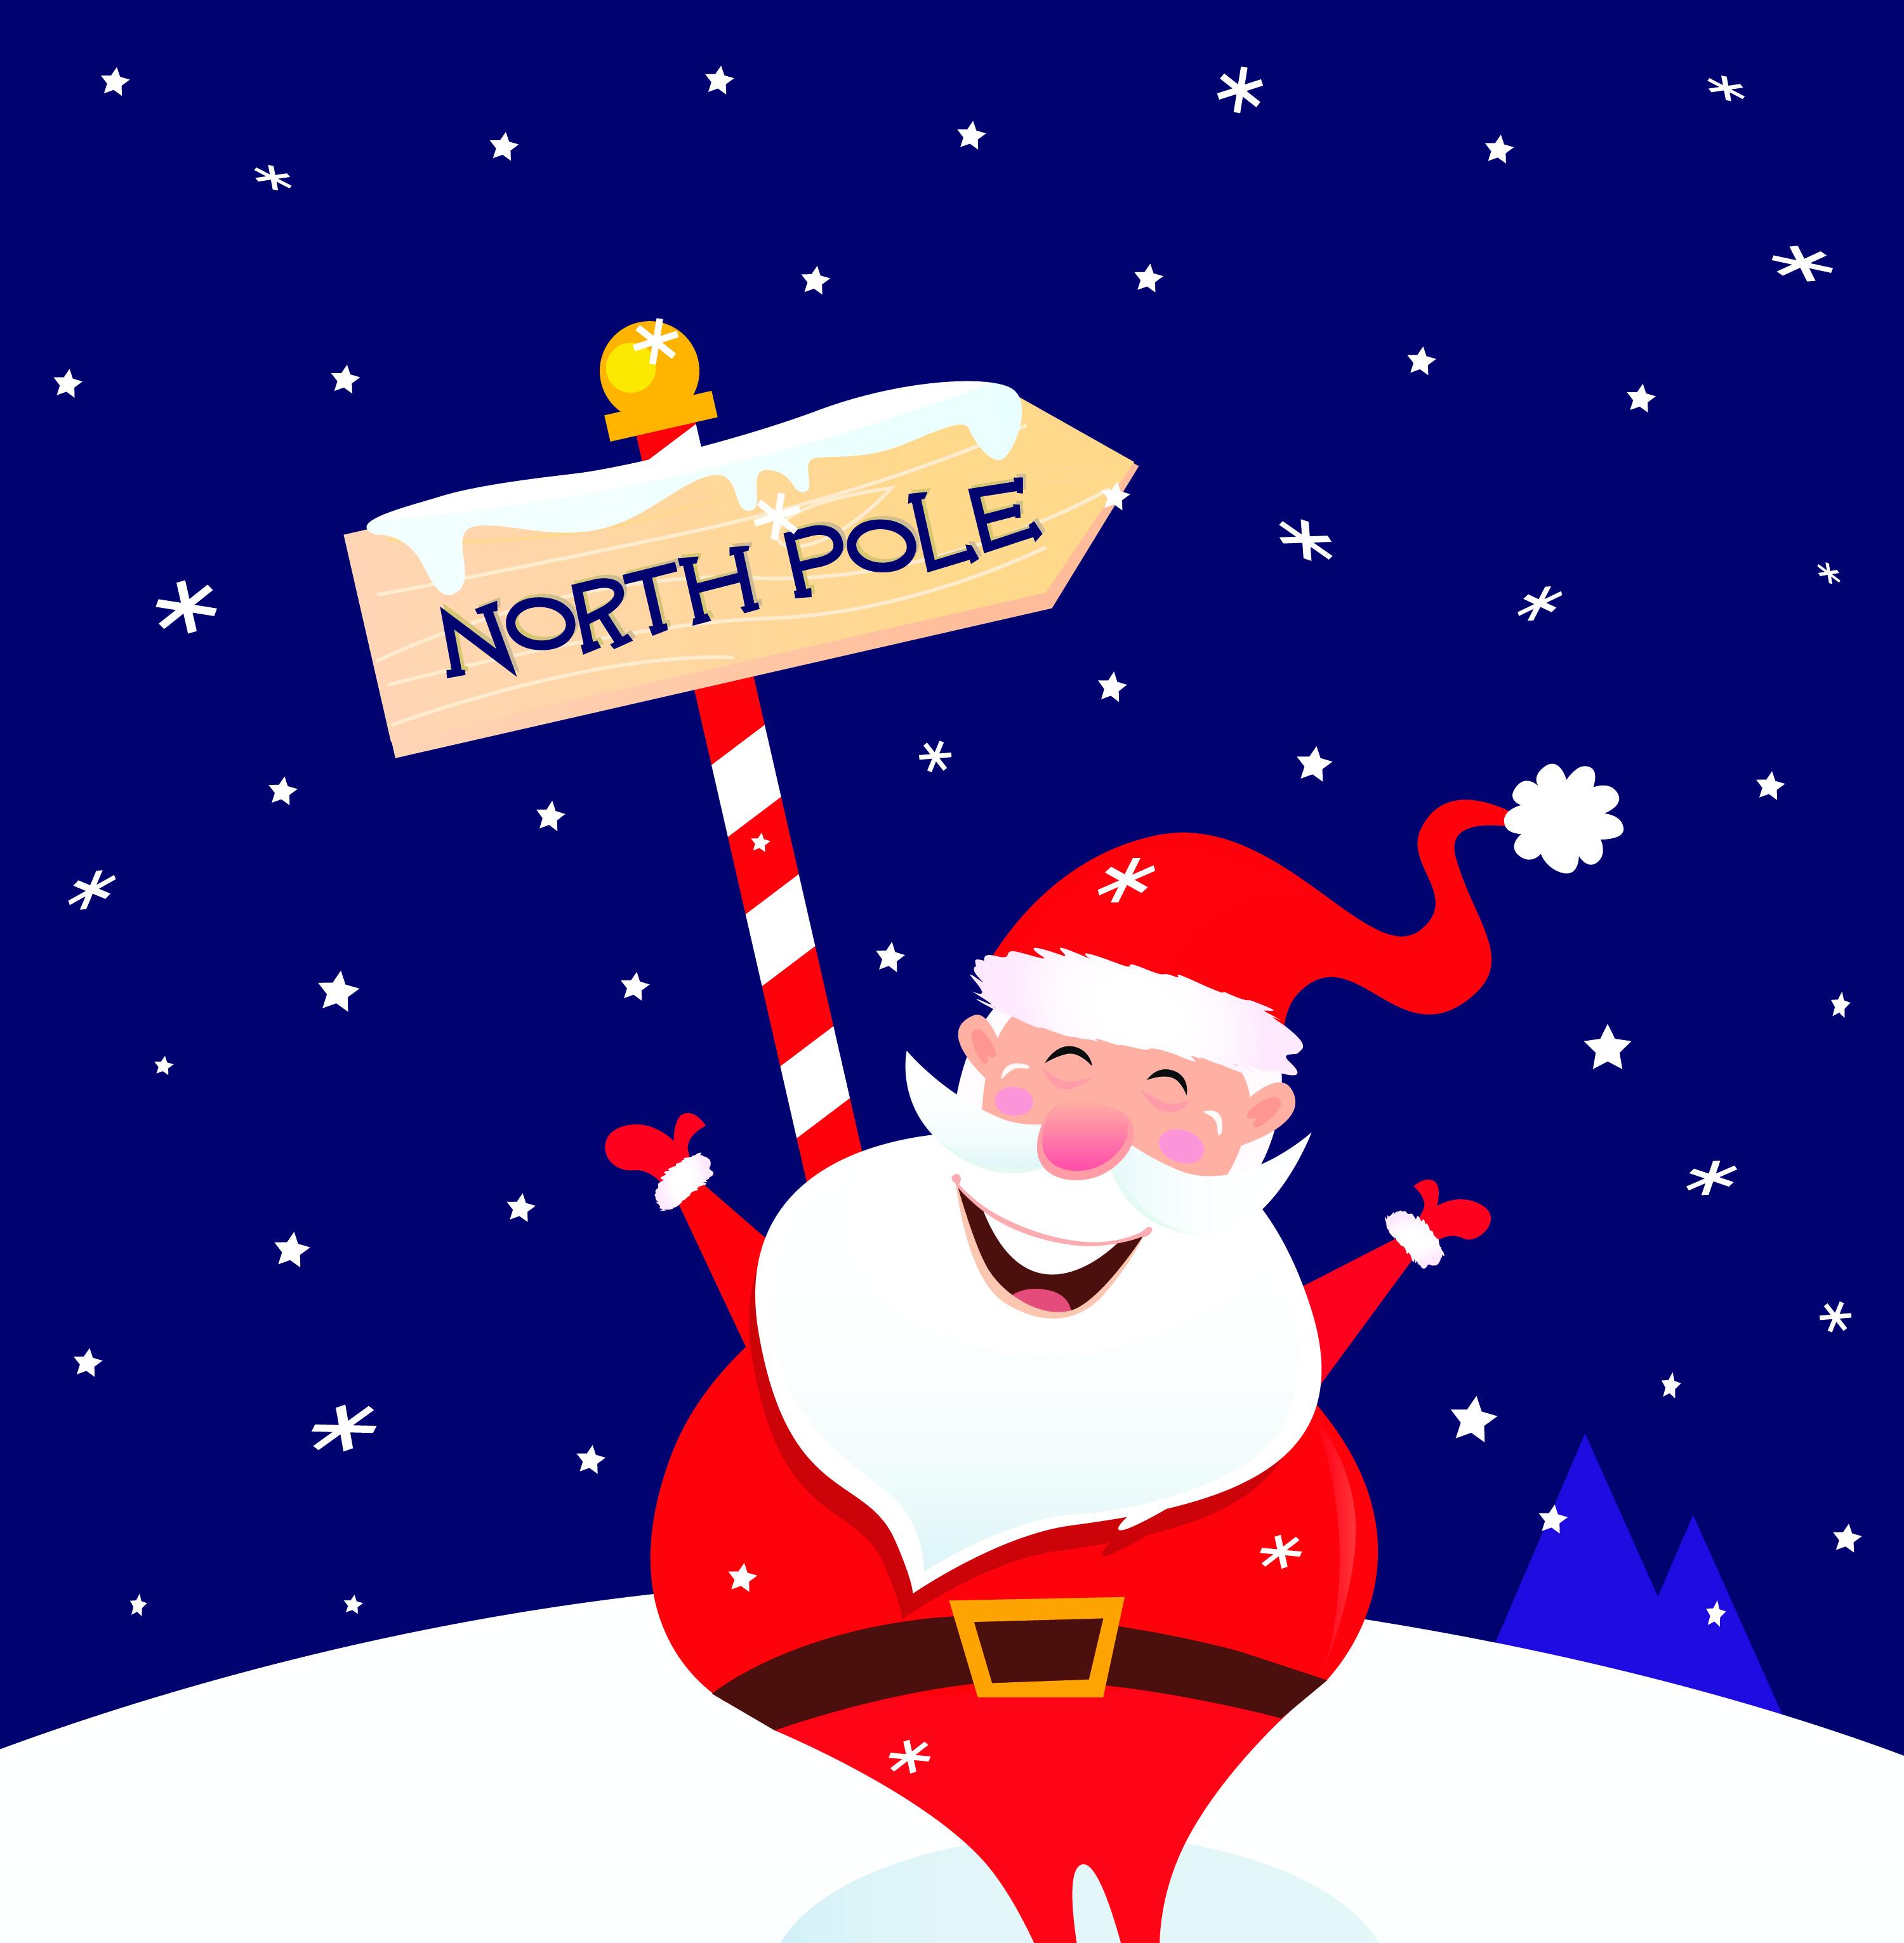 north poll stroll danville ky